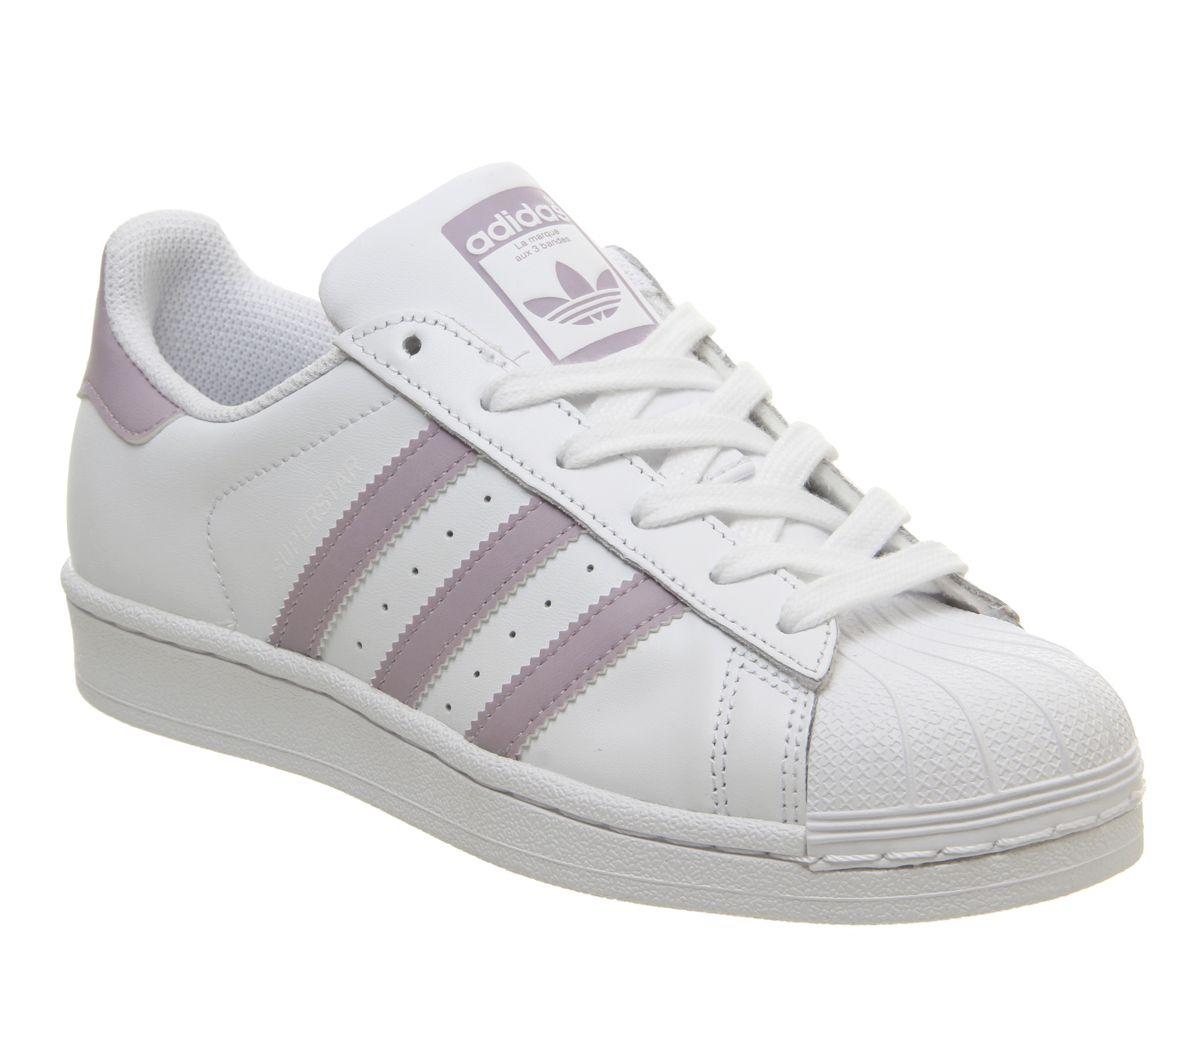 new arrival 12a45 e3976 SENTINEL Donna Adidas Superstar 1 formatori visione morbida nera scarpe da  ginnastica scarpe bianco